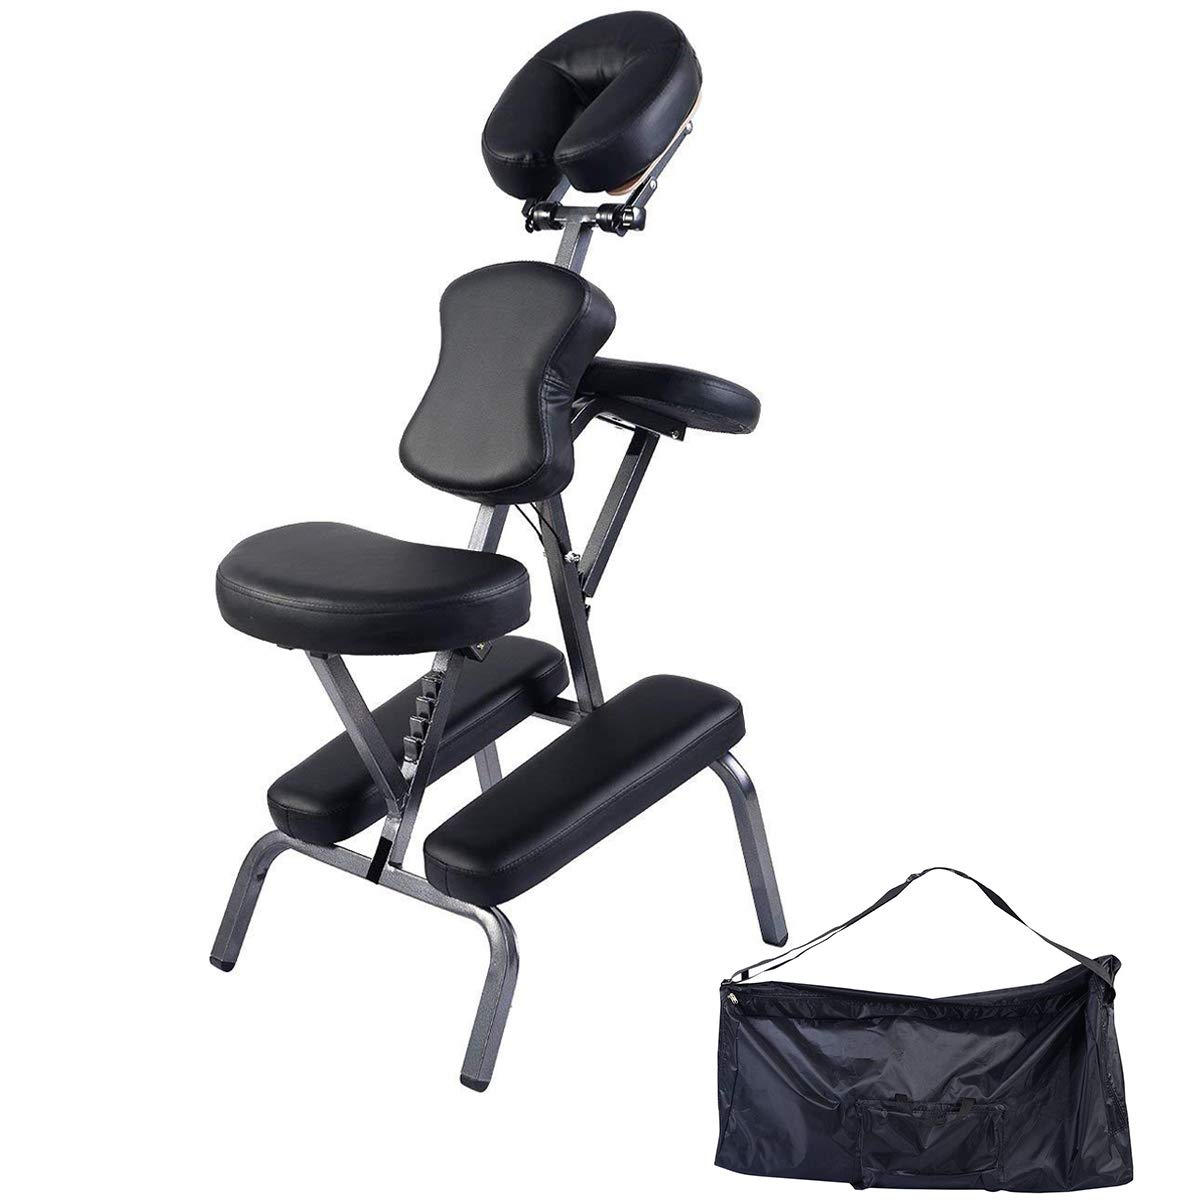 Giantex Portable Light Weight Massage Chair Travel Massage Tattoo Spa Chair w/Carrying Bag HW51339